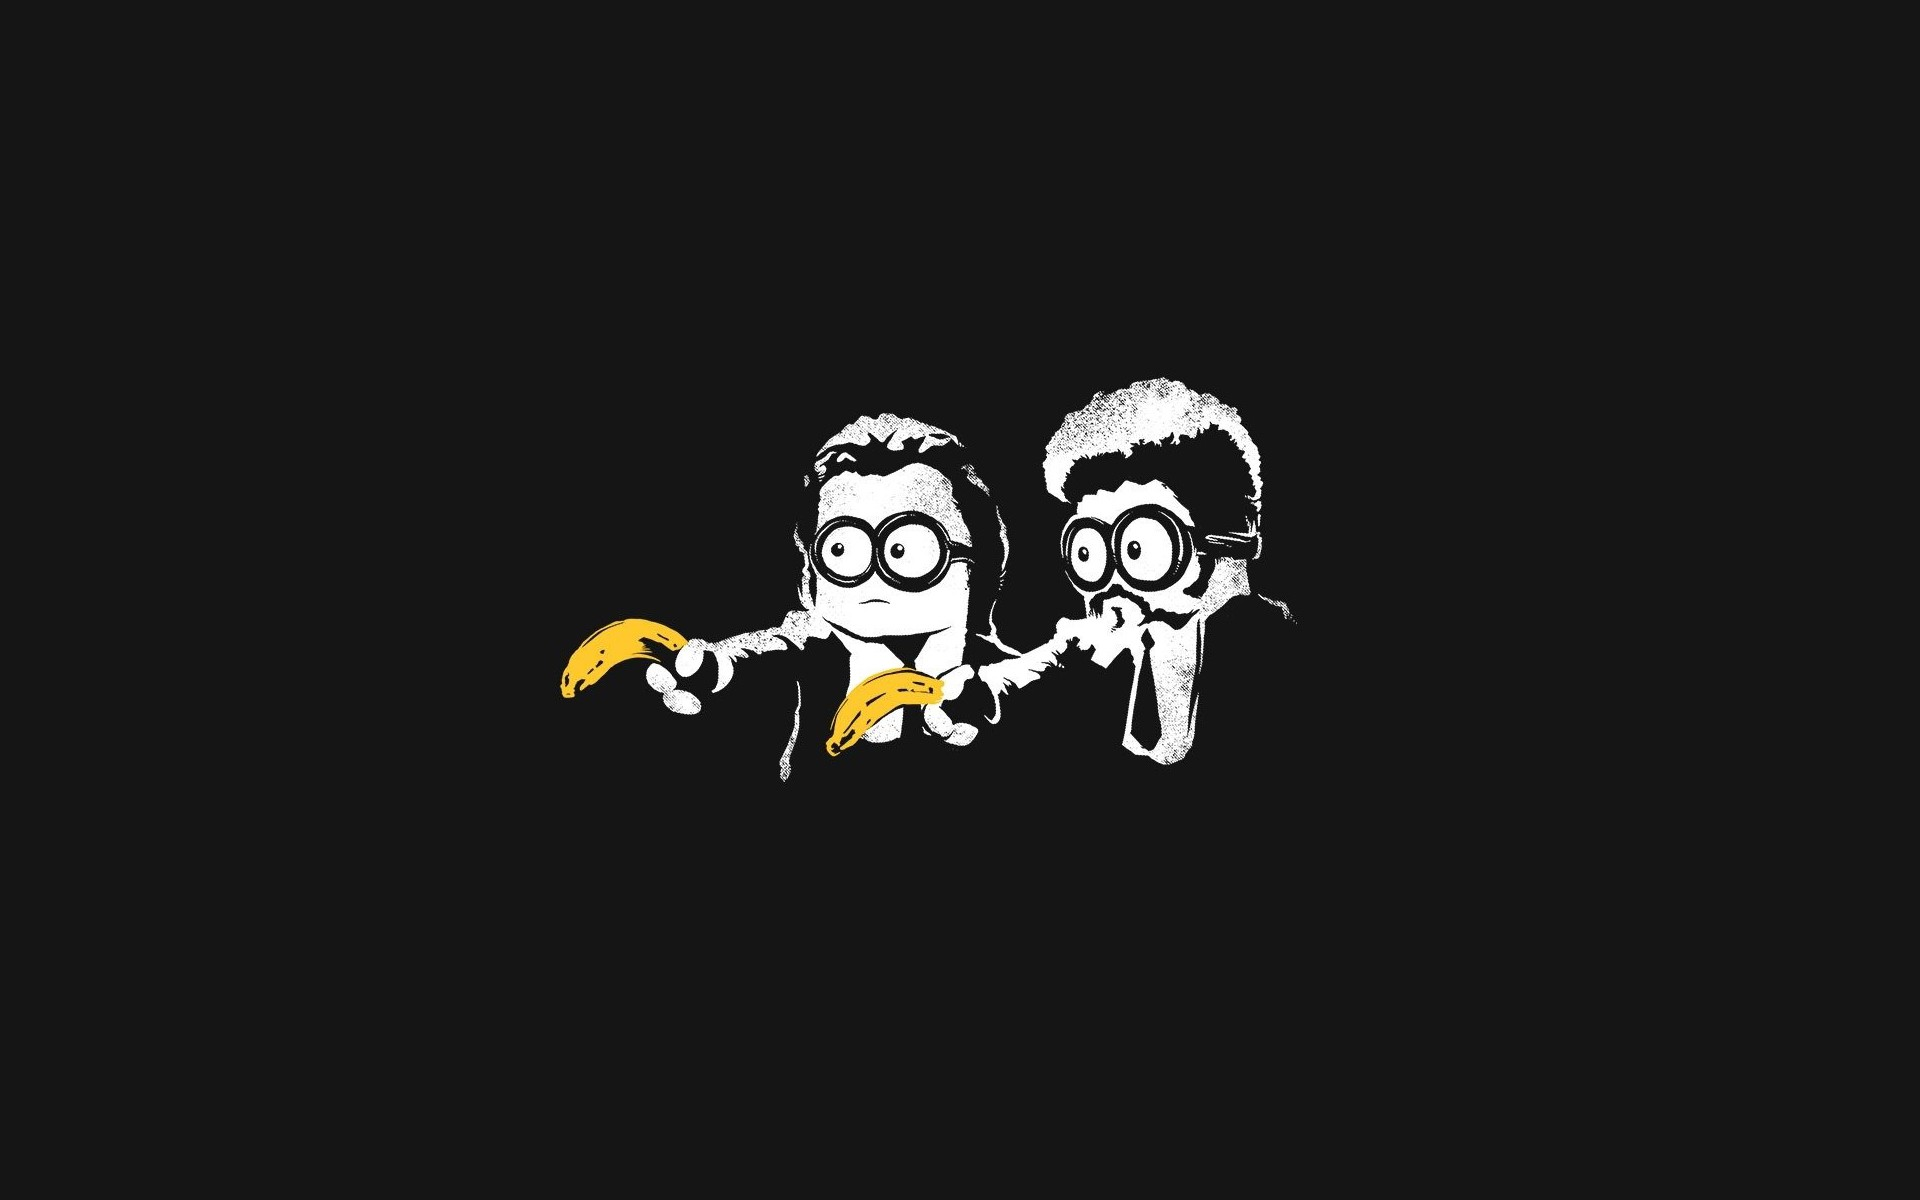 General 1920x1200 minimalism black minions Pulp Fiction bananas Pulp Fiction (parody) parody mix up movies fictional simple background black background